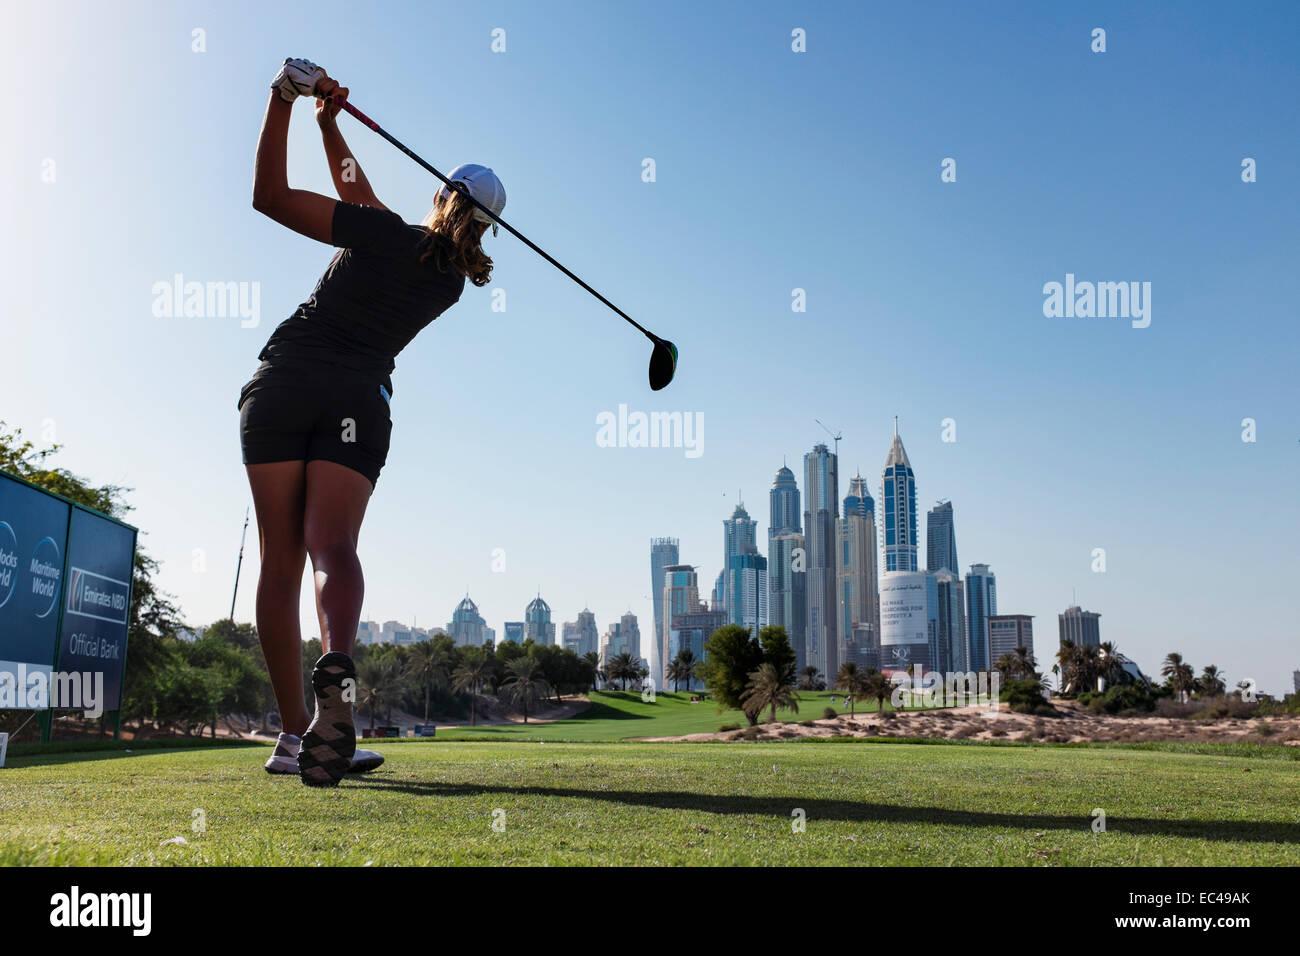 Dubai, Emiratos Árabes Unidos. El 9 de diciembre de 2014. Cheyenne Woods (sobrina de Tiger Woods) de los Estados Imagen De Stock